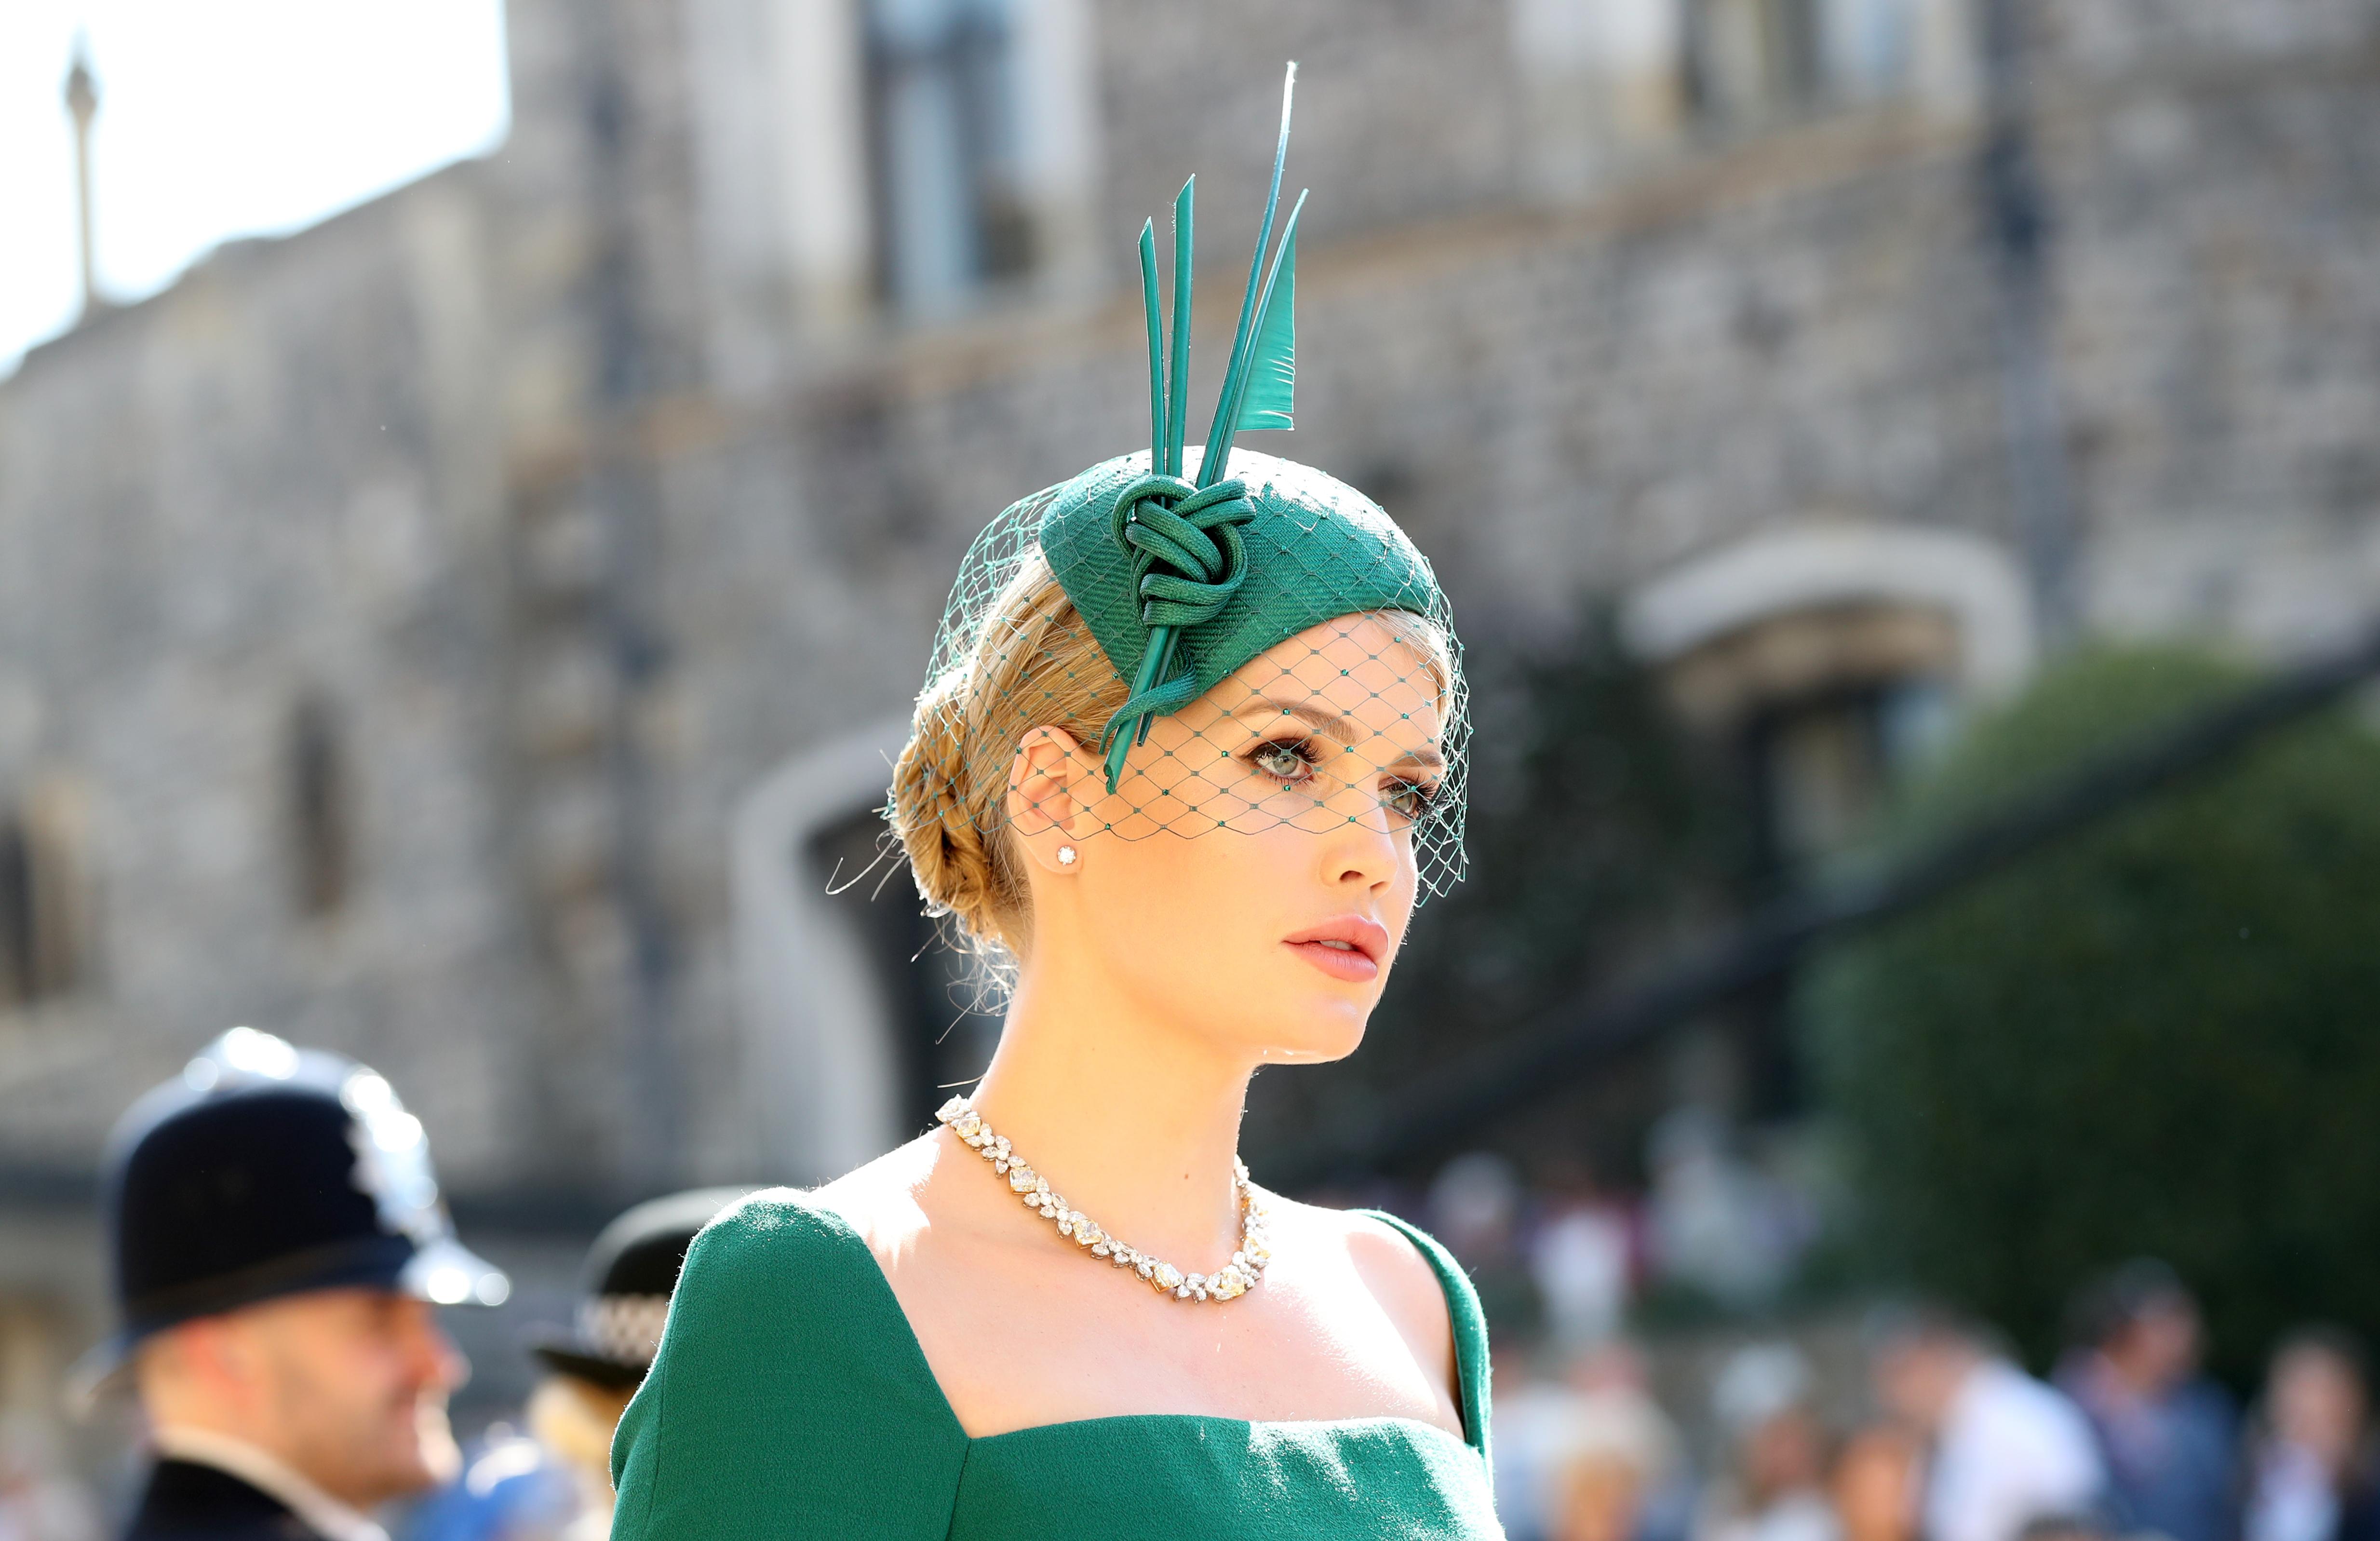 Lady Kitty Spencer chose an emerald green fascinator with sculptural  detailing (Gareth Fuller PA) 2e2e392b0a7